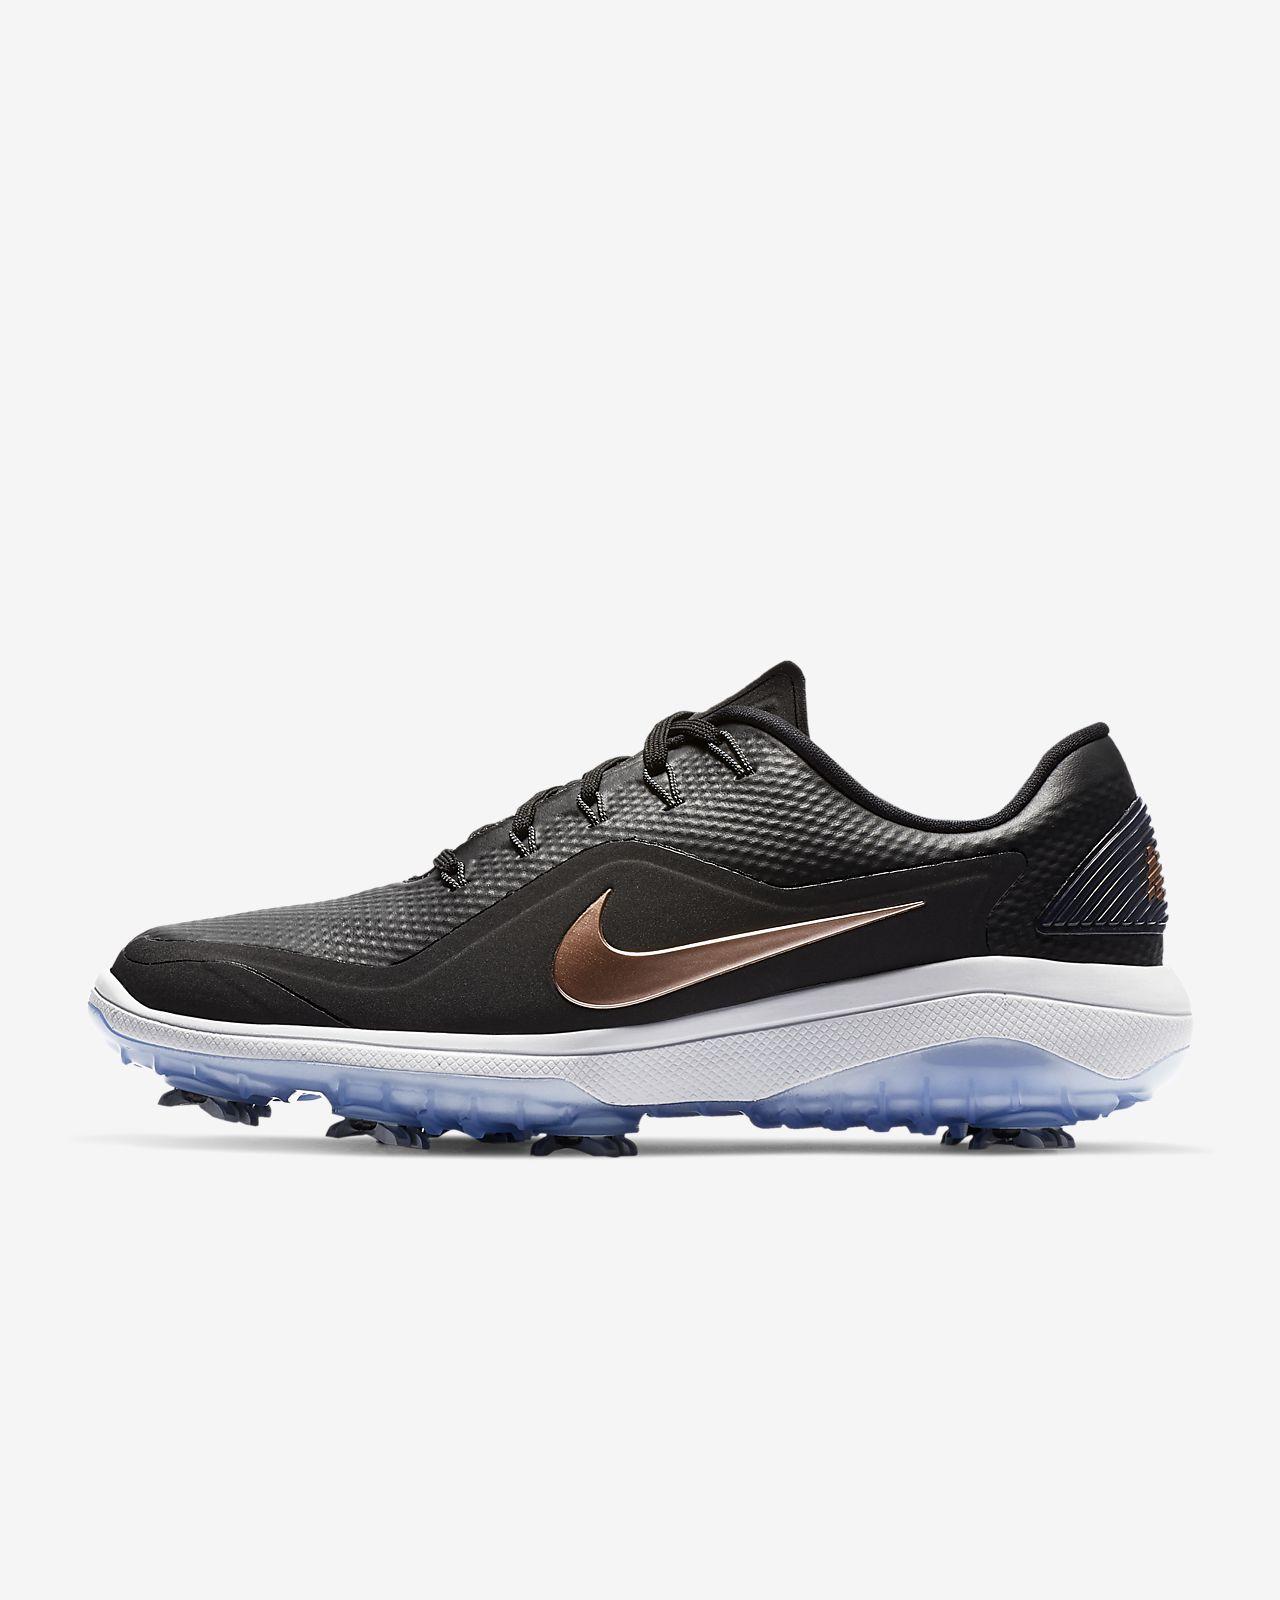 8c5c1e048820ed Nike React Vapor 2 Women s Golf Shoe. Nike.com